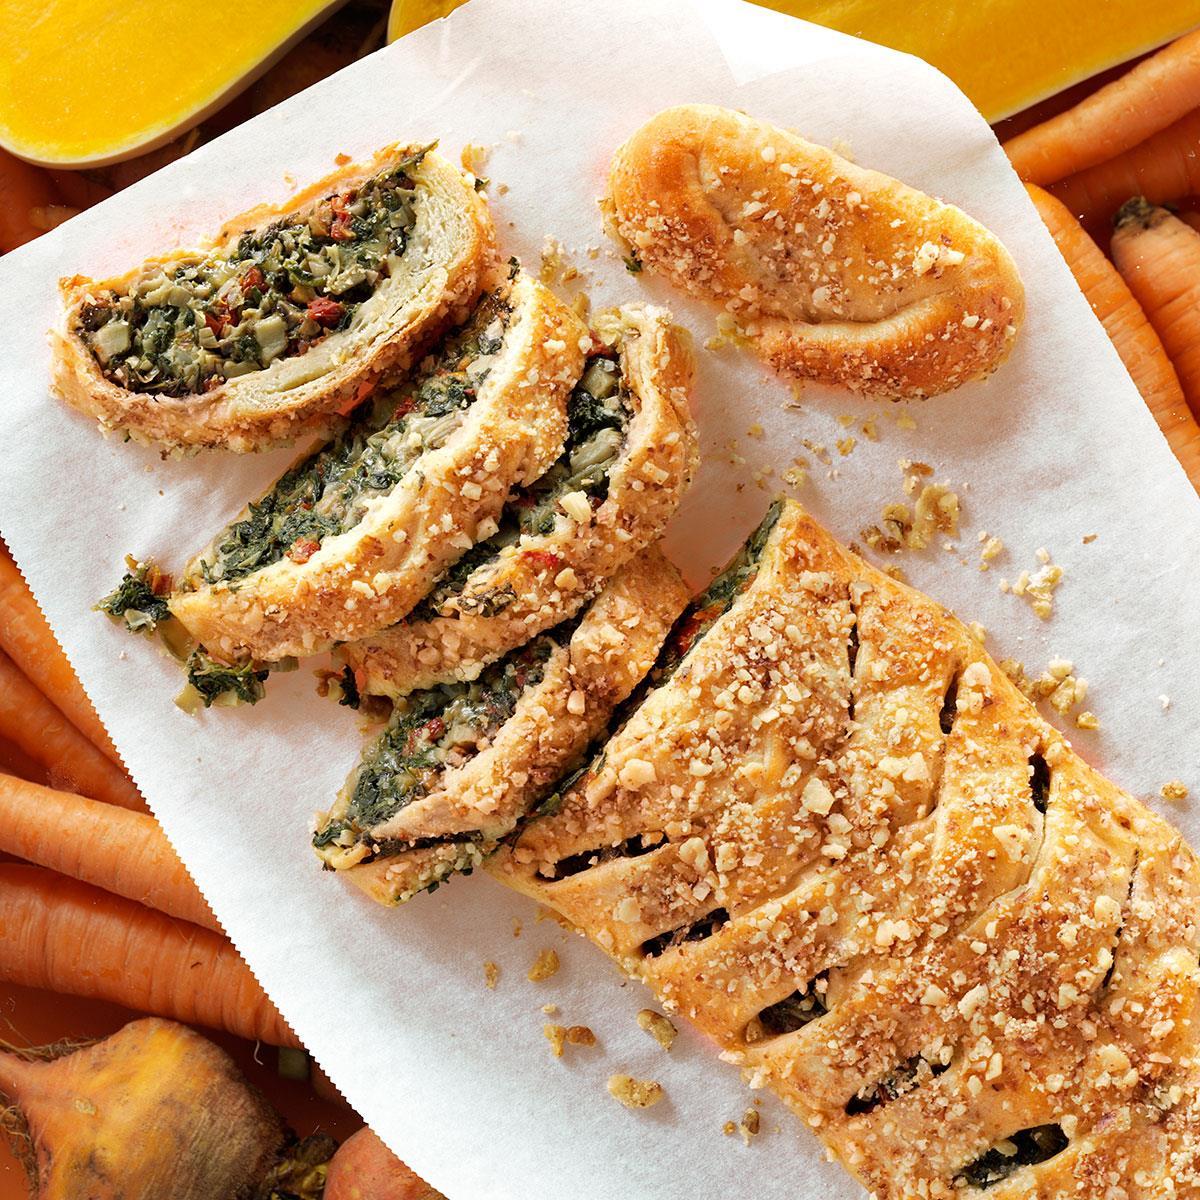 70 Saucy Creamy And Cheesy Italian Christmas Food Recipes: Tuscan Artichoke & Spinach Strudel Recipe